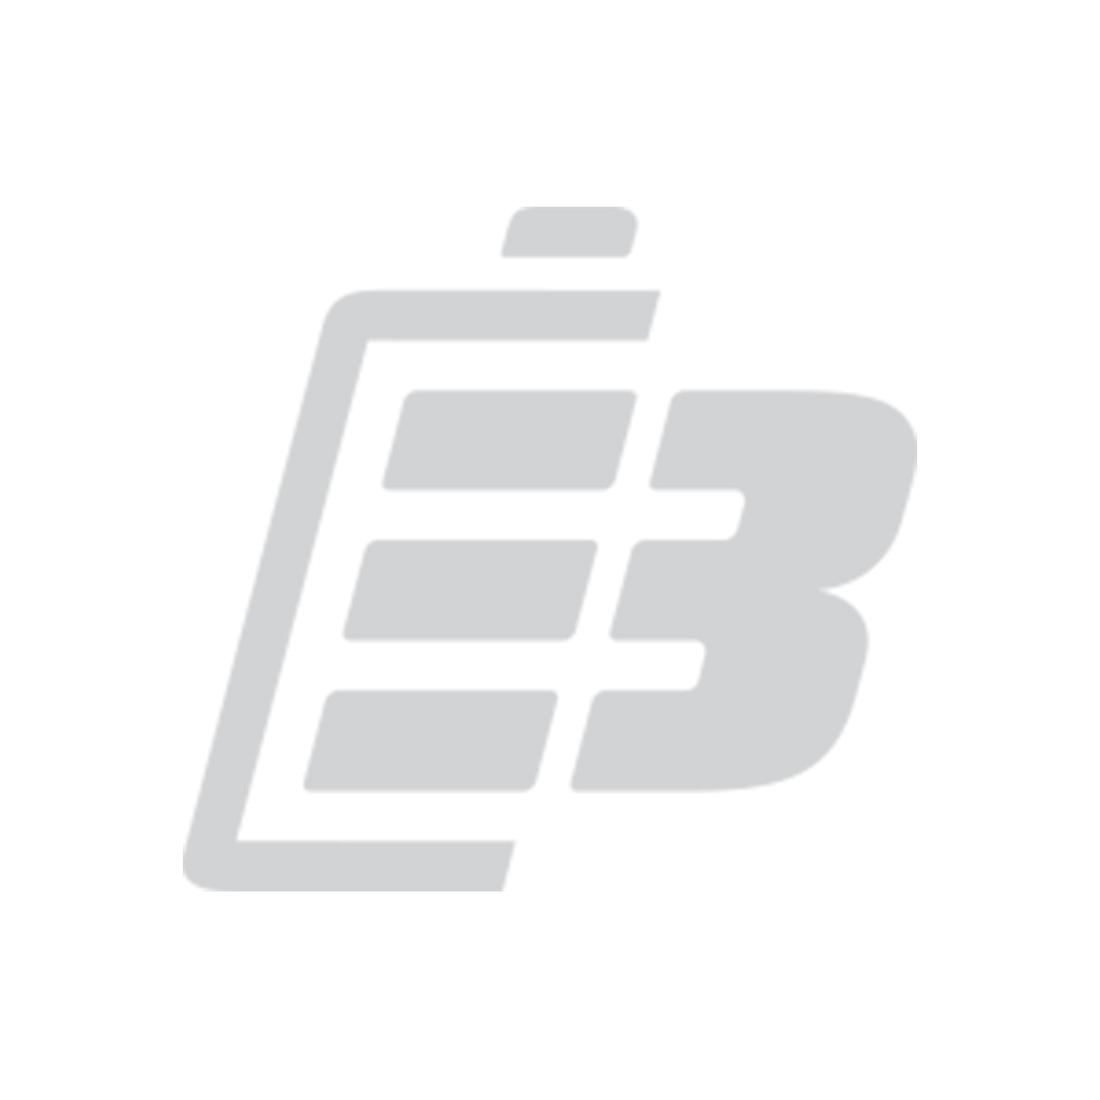 361 - 362 Energizer button Batteryv 1